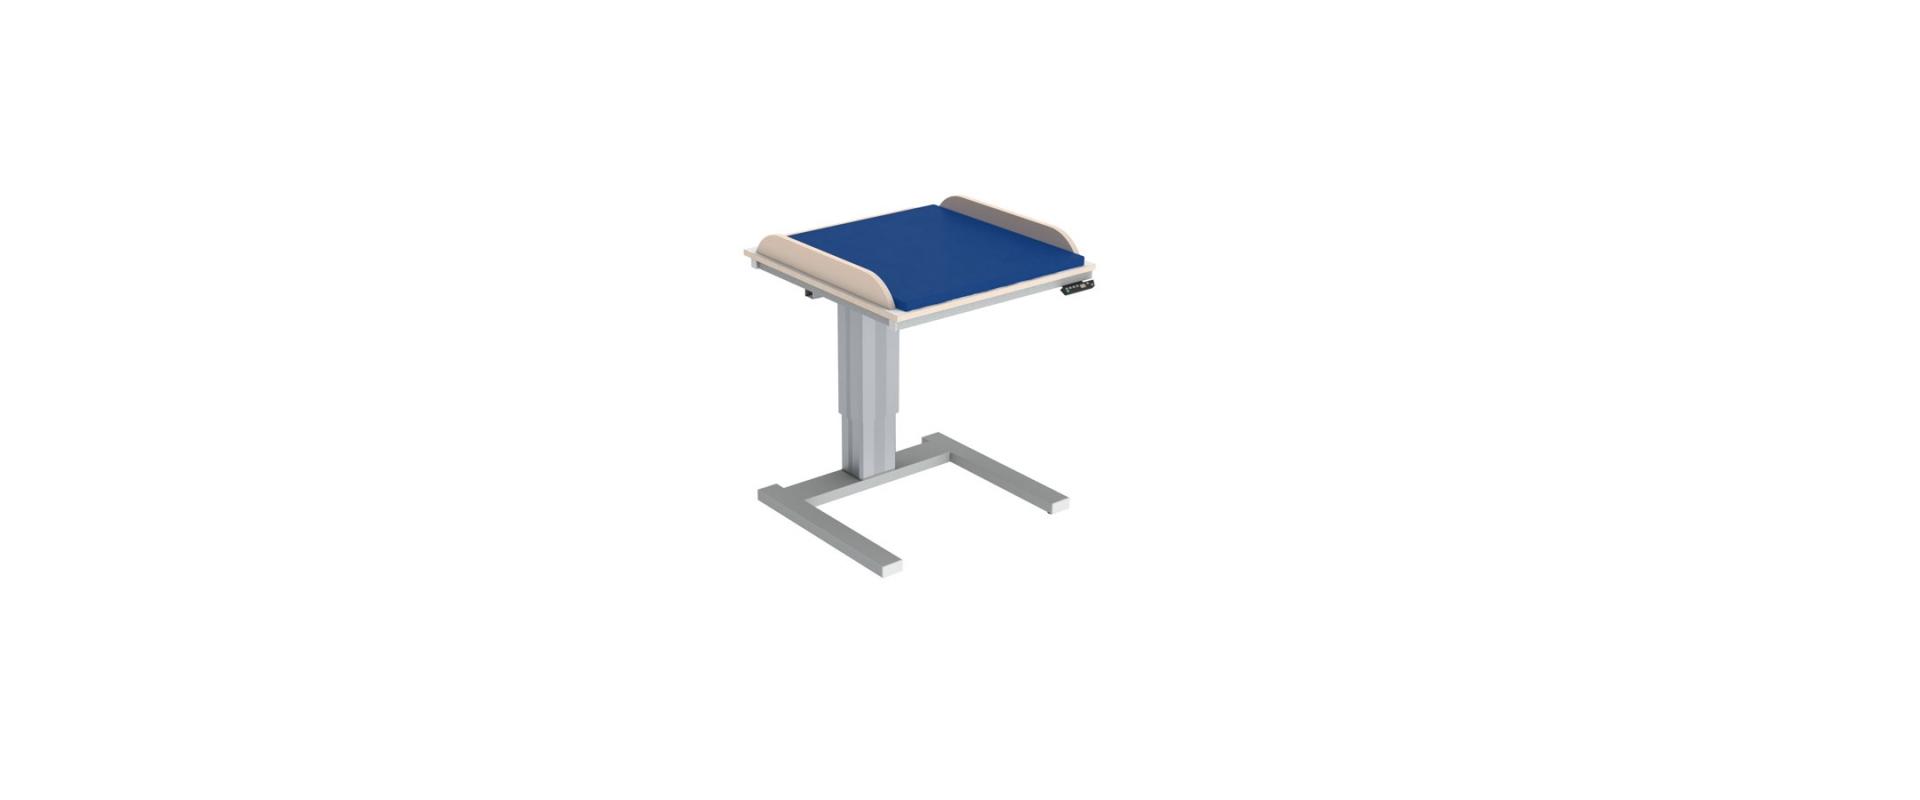 <b>KID 332 - 332 - Bygg din egen modell, 62-120x80 cm</b>